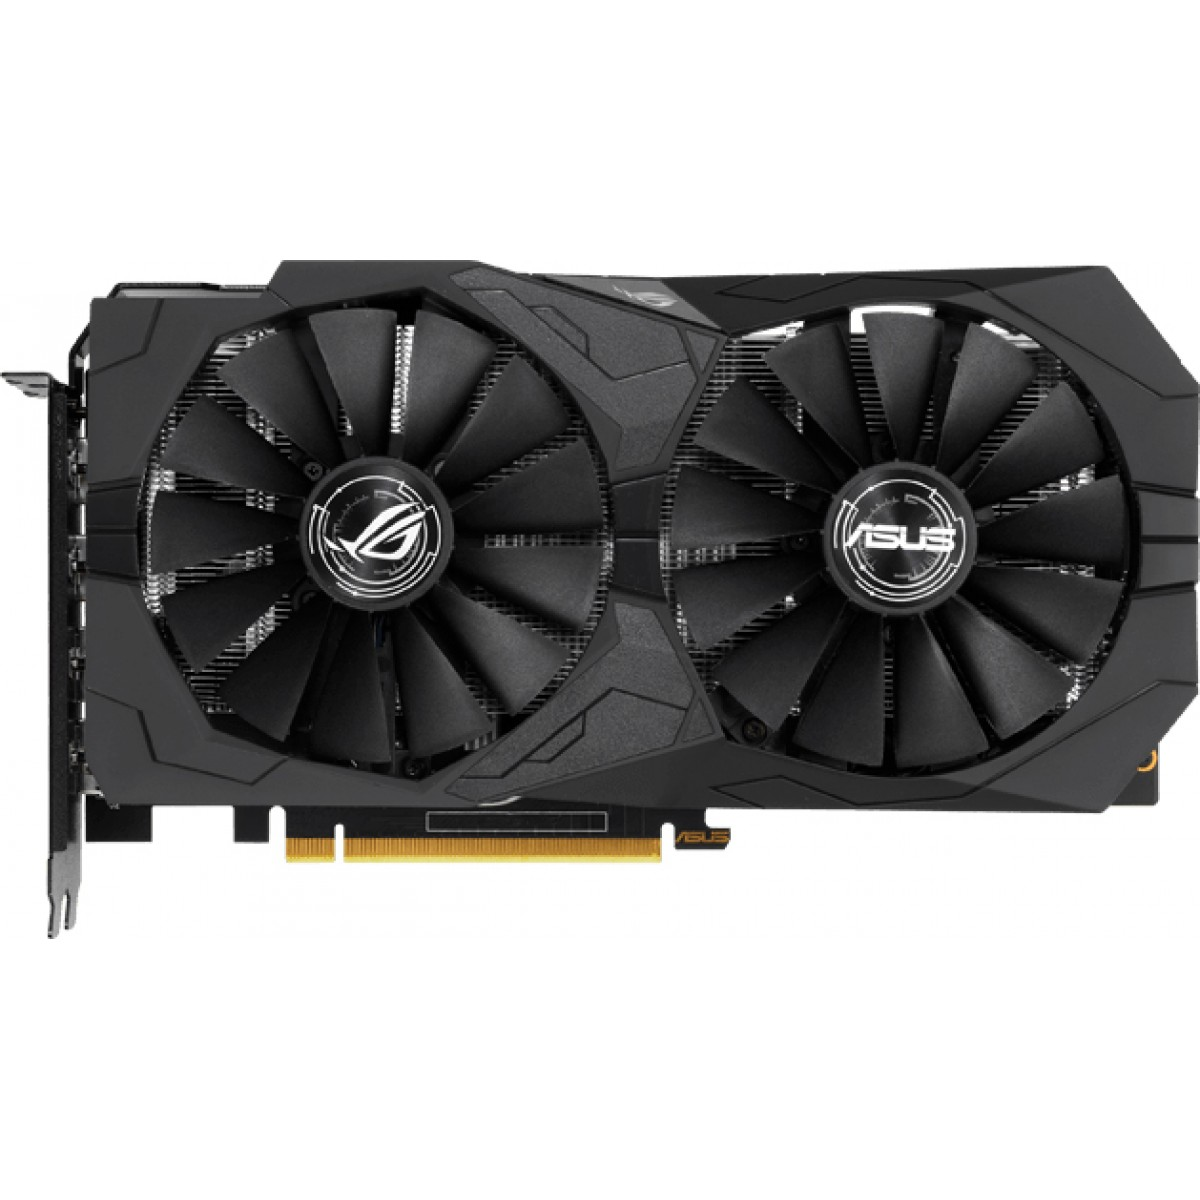 Placa de Vídeo Asus GeForce GTX 1650 Rog Strix Gaming, 4GB GDDR5, 128Bit, ROG-STRIX-GTX1650-4G-GAMING